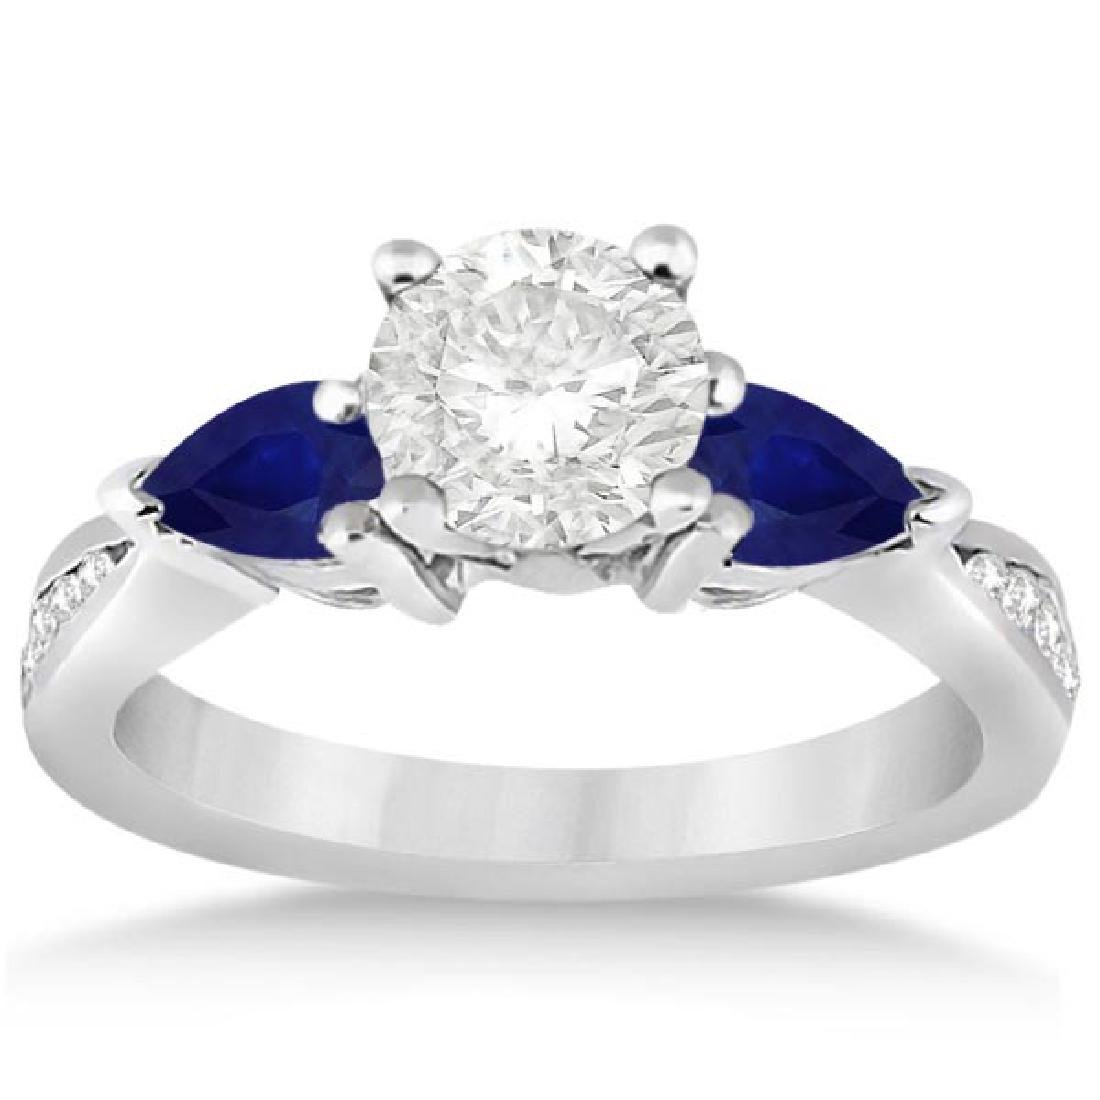 Diamond and Pear Blue Sapphire Engagement Ring Palladiu